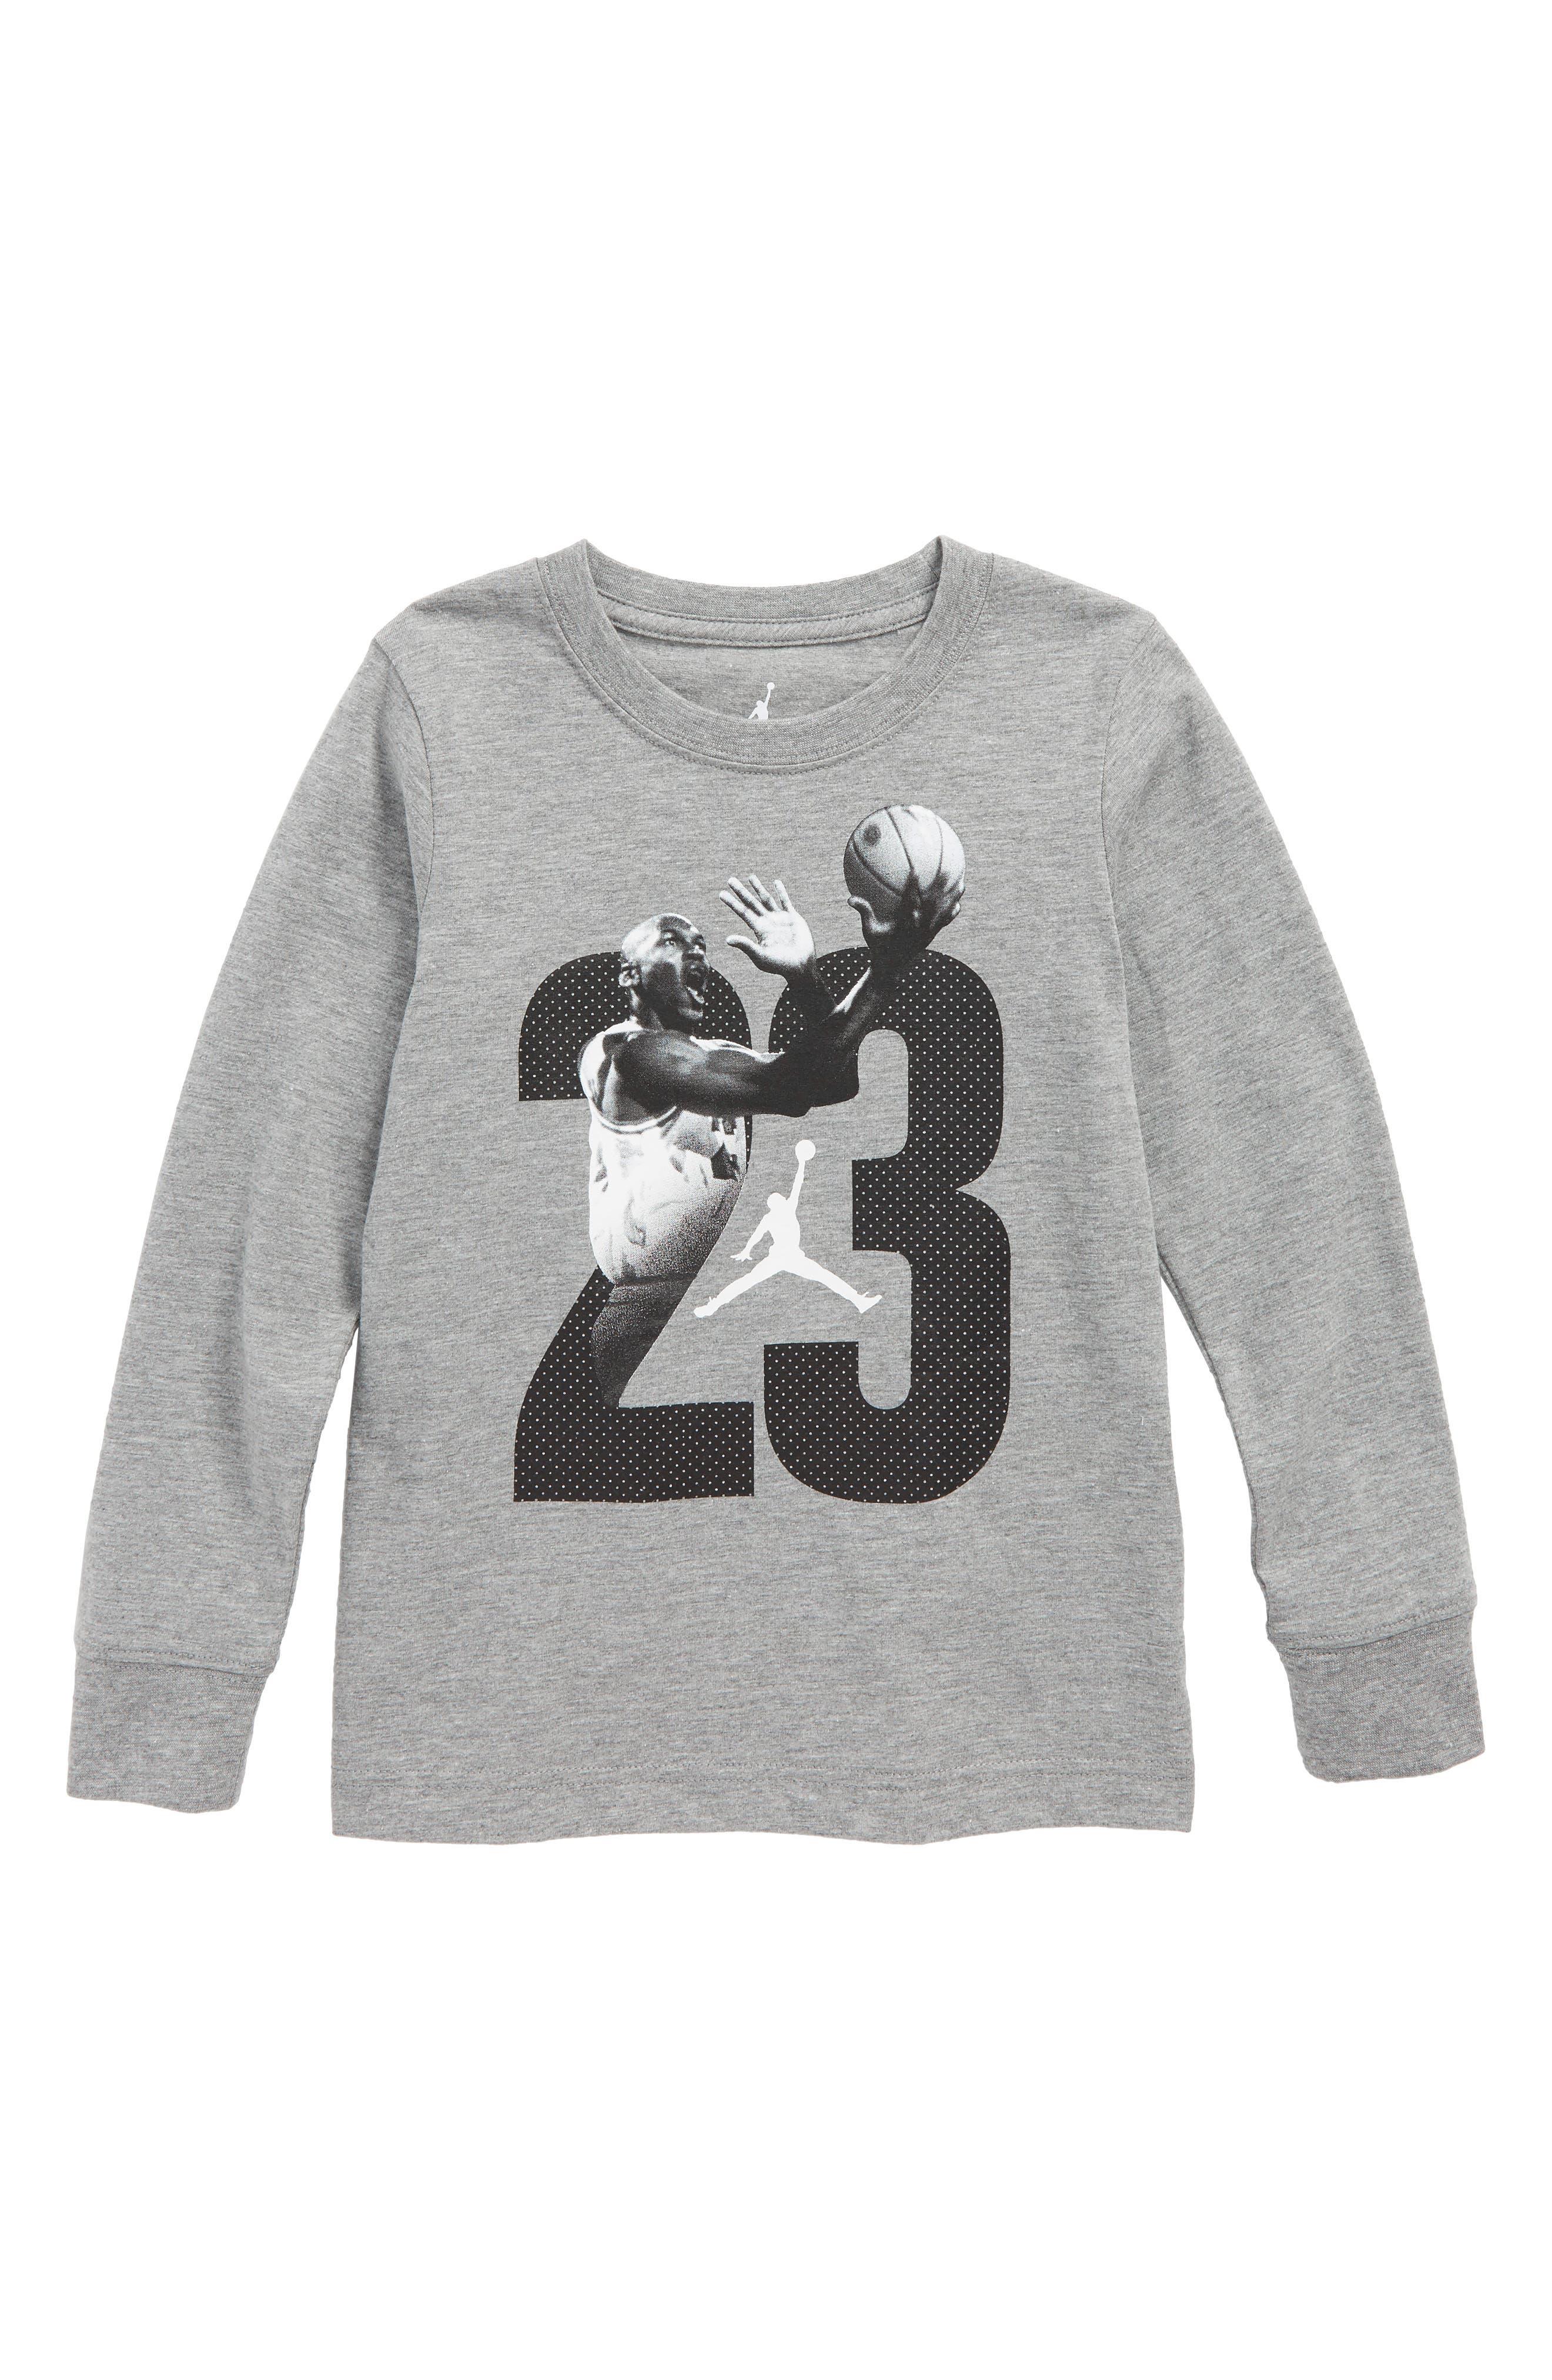 Jordan 23 Graphic Long Sleeve T-Shirt,                             Main thumbnail 1, color,                             Carbon Heather